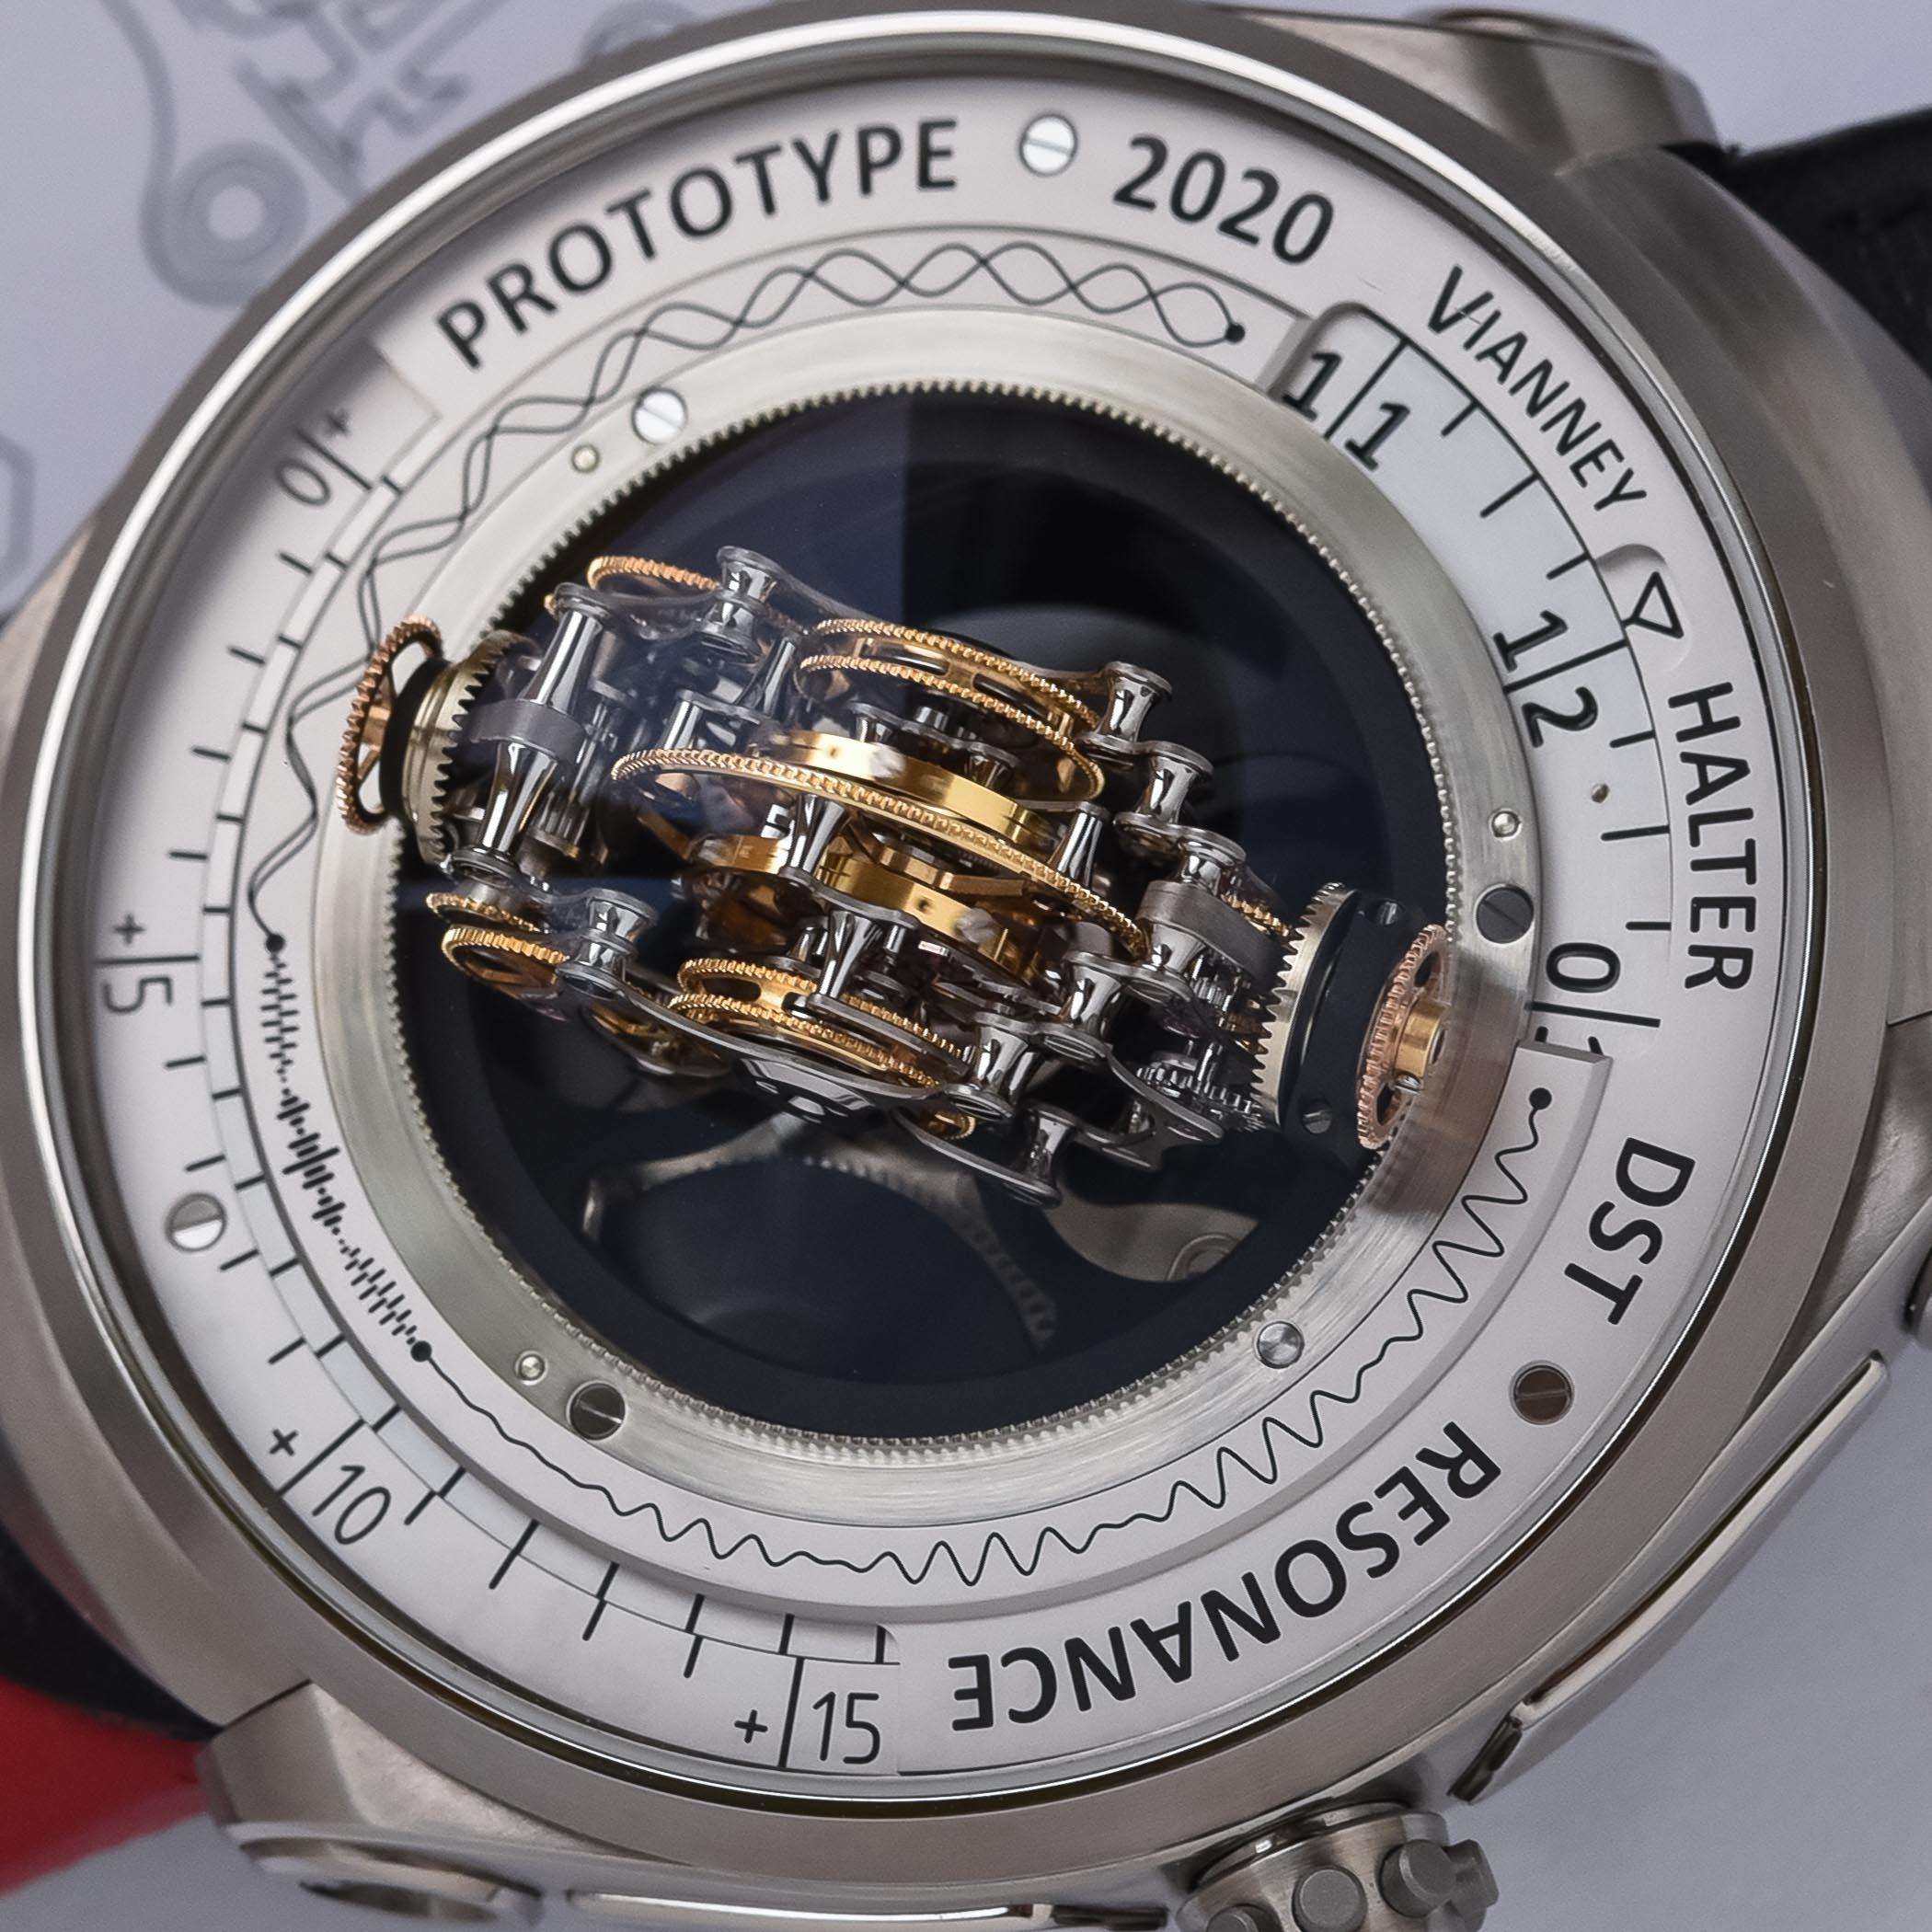 Vianney Halter Deep Space Resonance Tourbillon Prototype